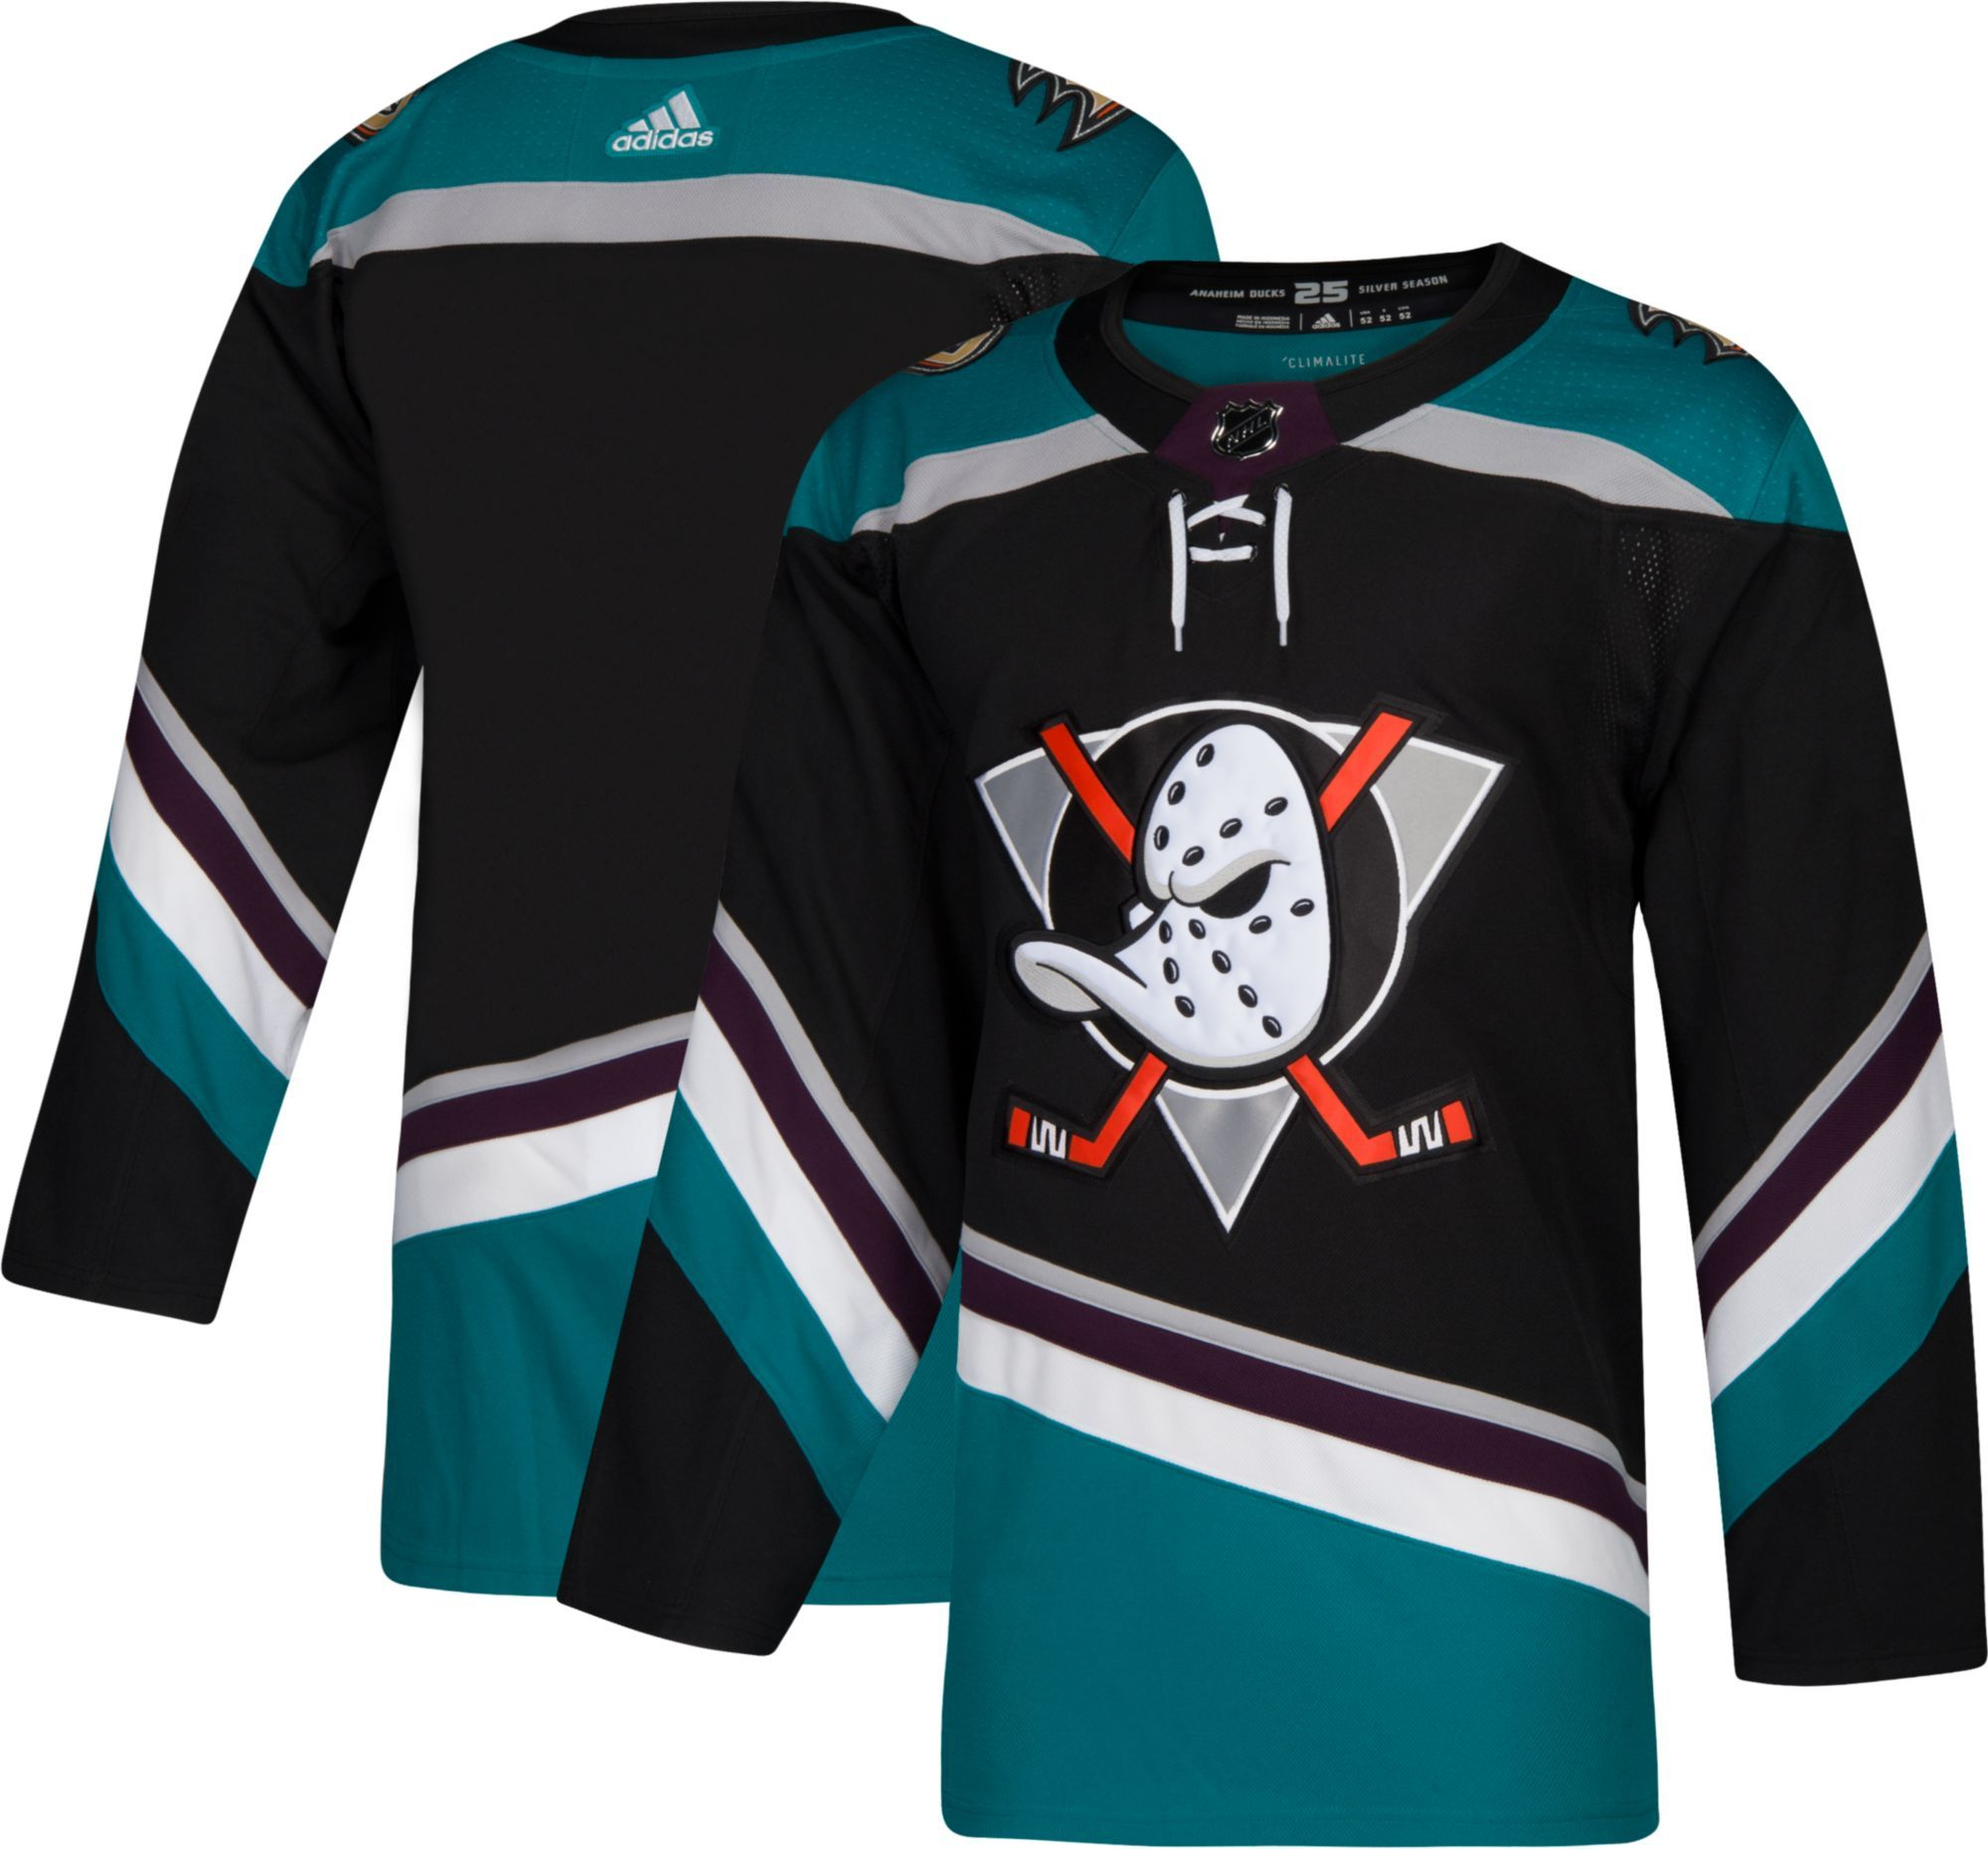 9e6d79398 adidas Men's Anaheim Ducks Authentic Pro Alternate Jersey in 2019 ...